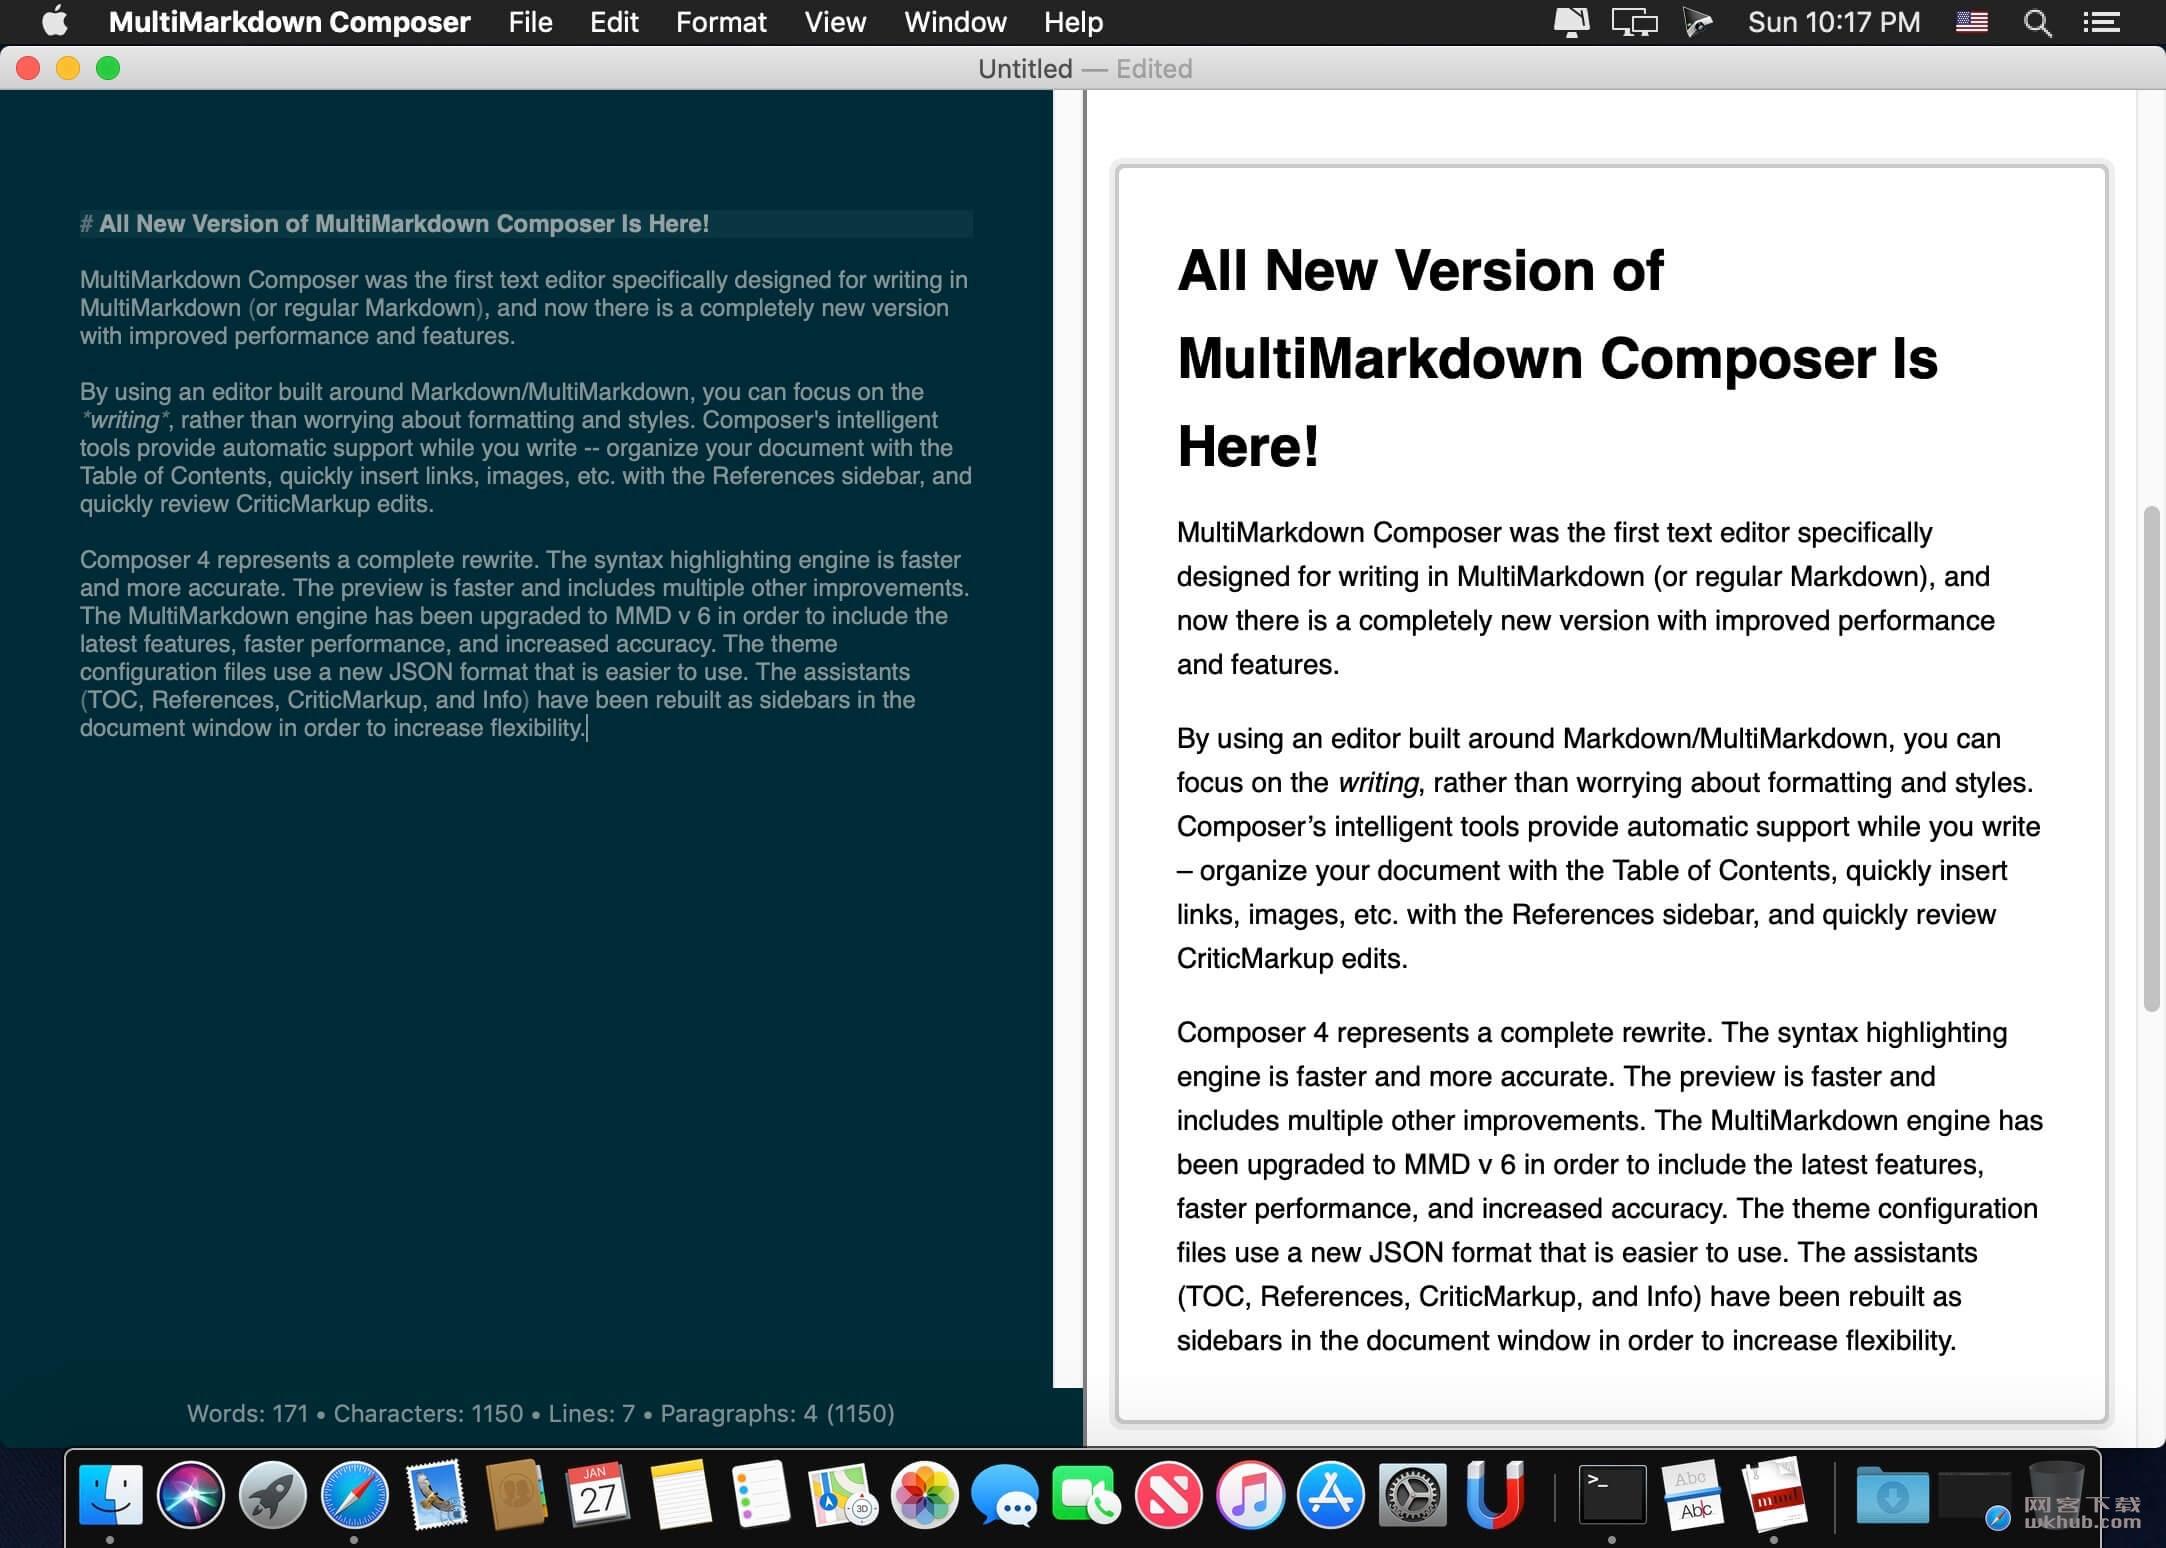 MultiMarkdown Composer Pro 4.5.12 文本编辑工具